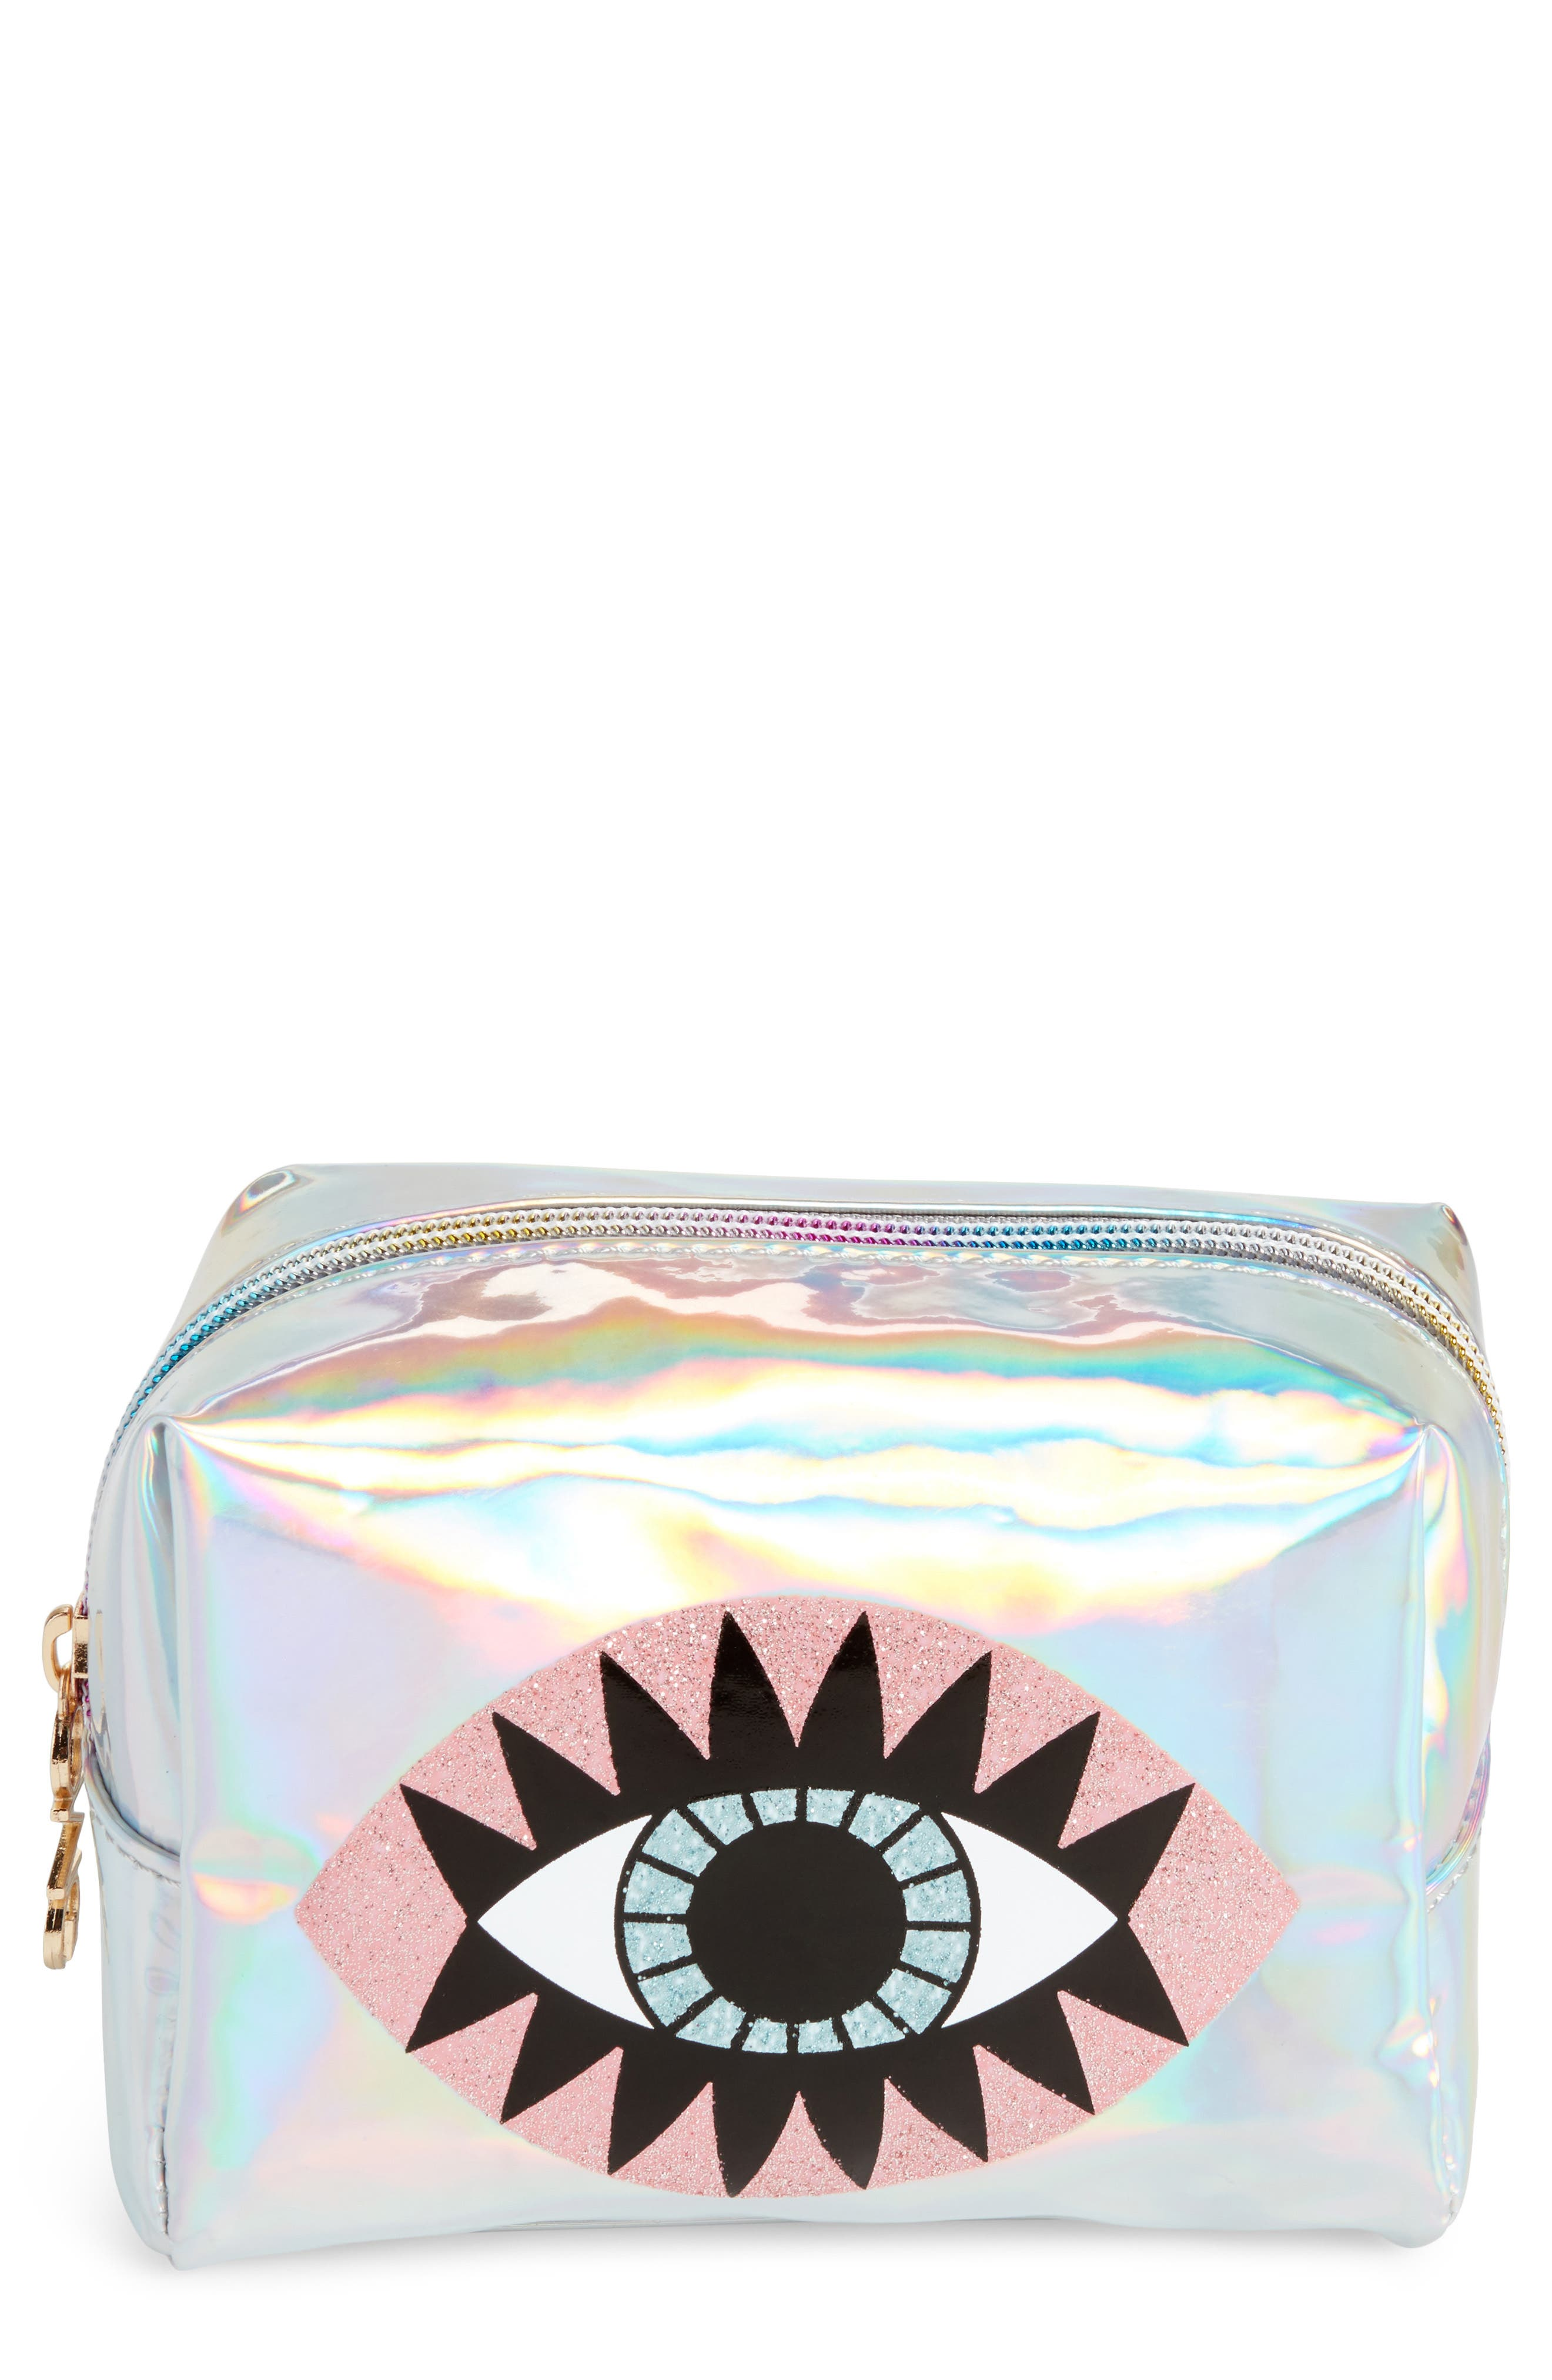 Glitter Eye Iridescent Cosmetics Bag,                         Main,                         color, 040